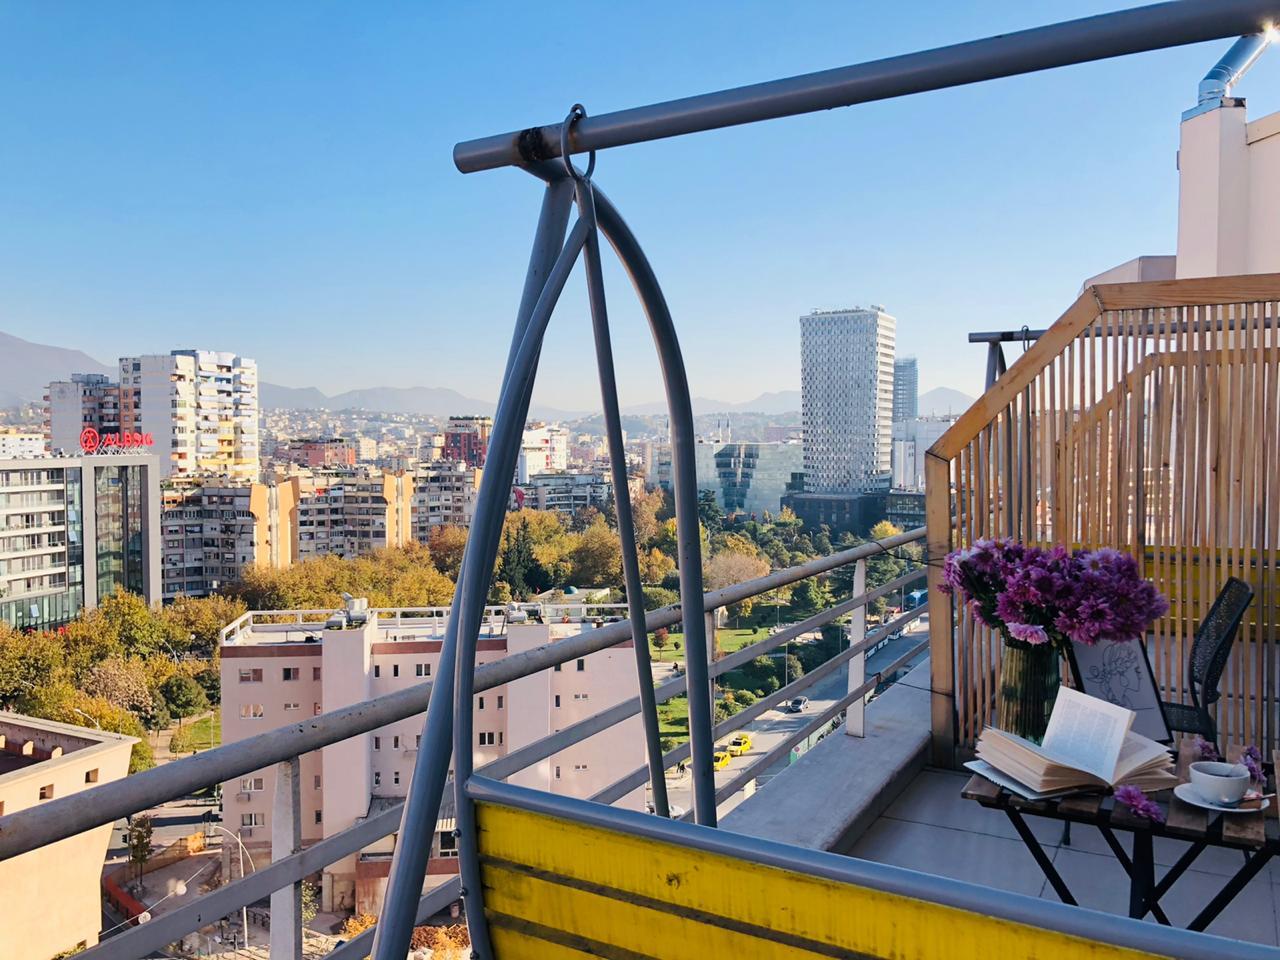 Garzoniere me qira ditore ne qender te Tiranes